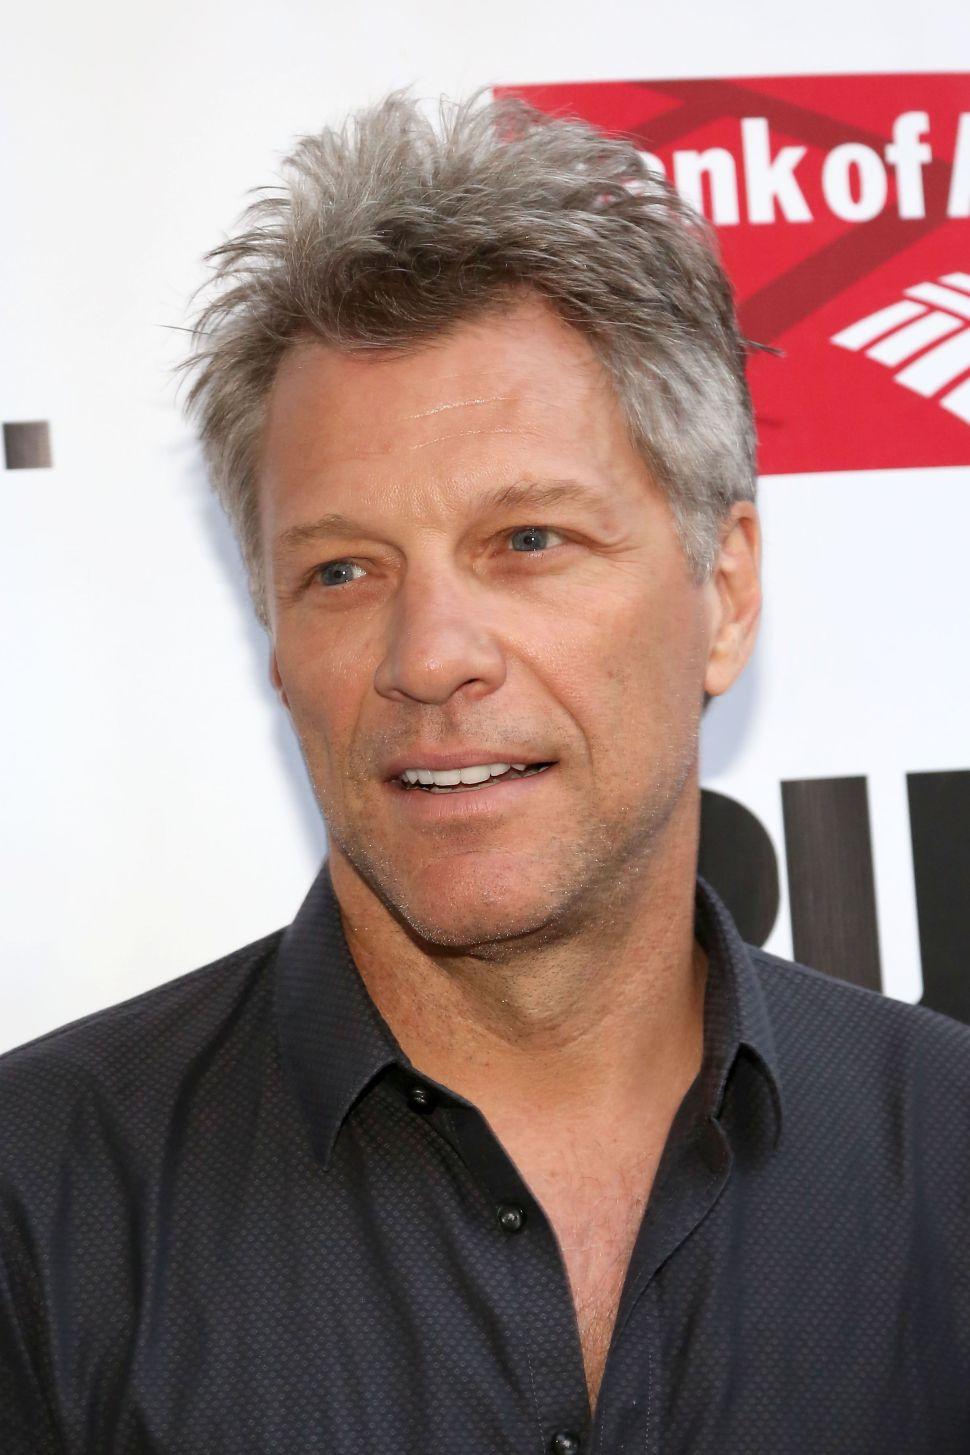 Jon Bon Jovi's West Village Prayers Have Been Answered